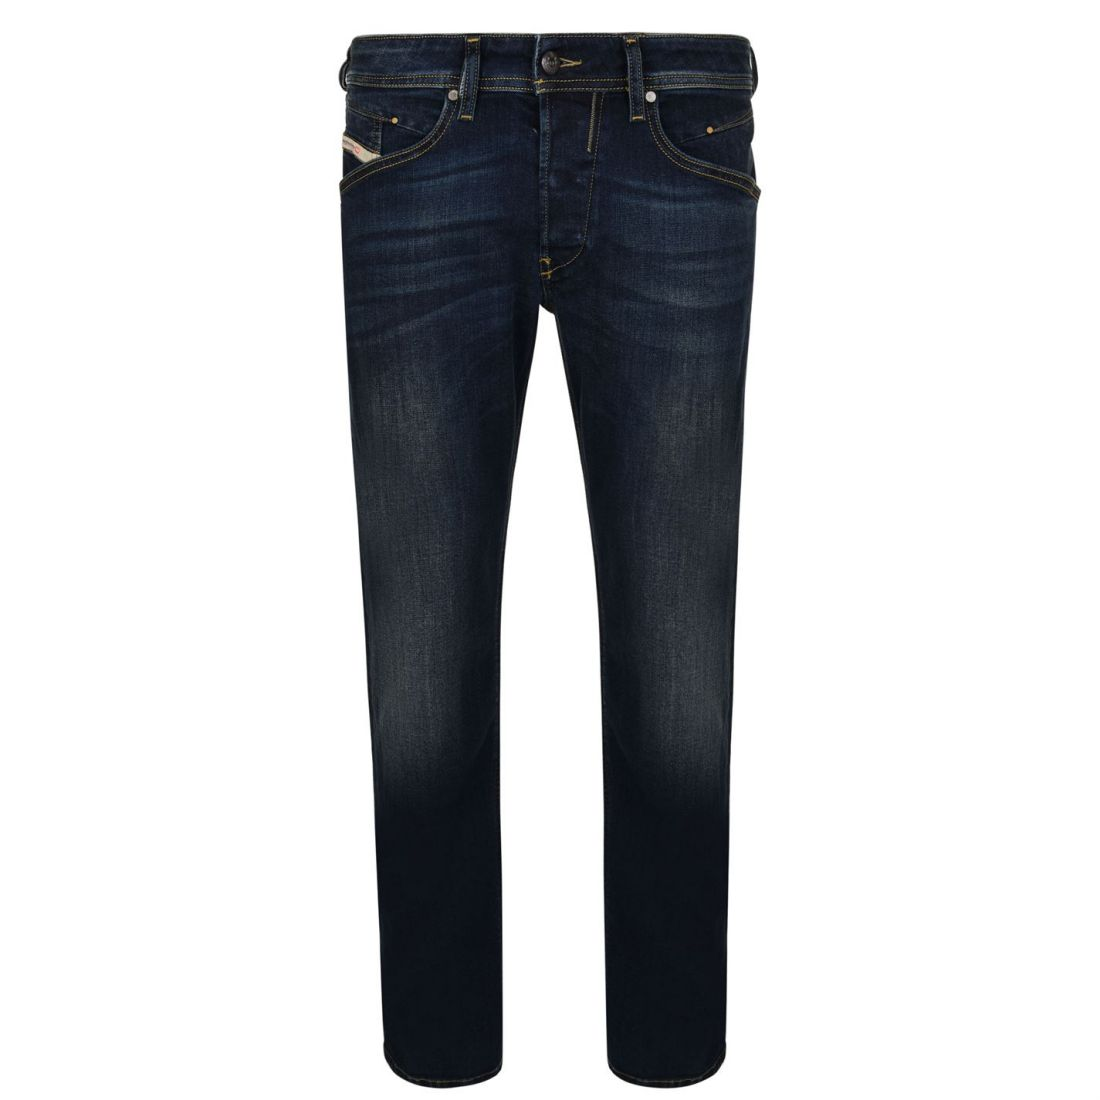 Mens Diesel Tapered Jeans Distressed New